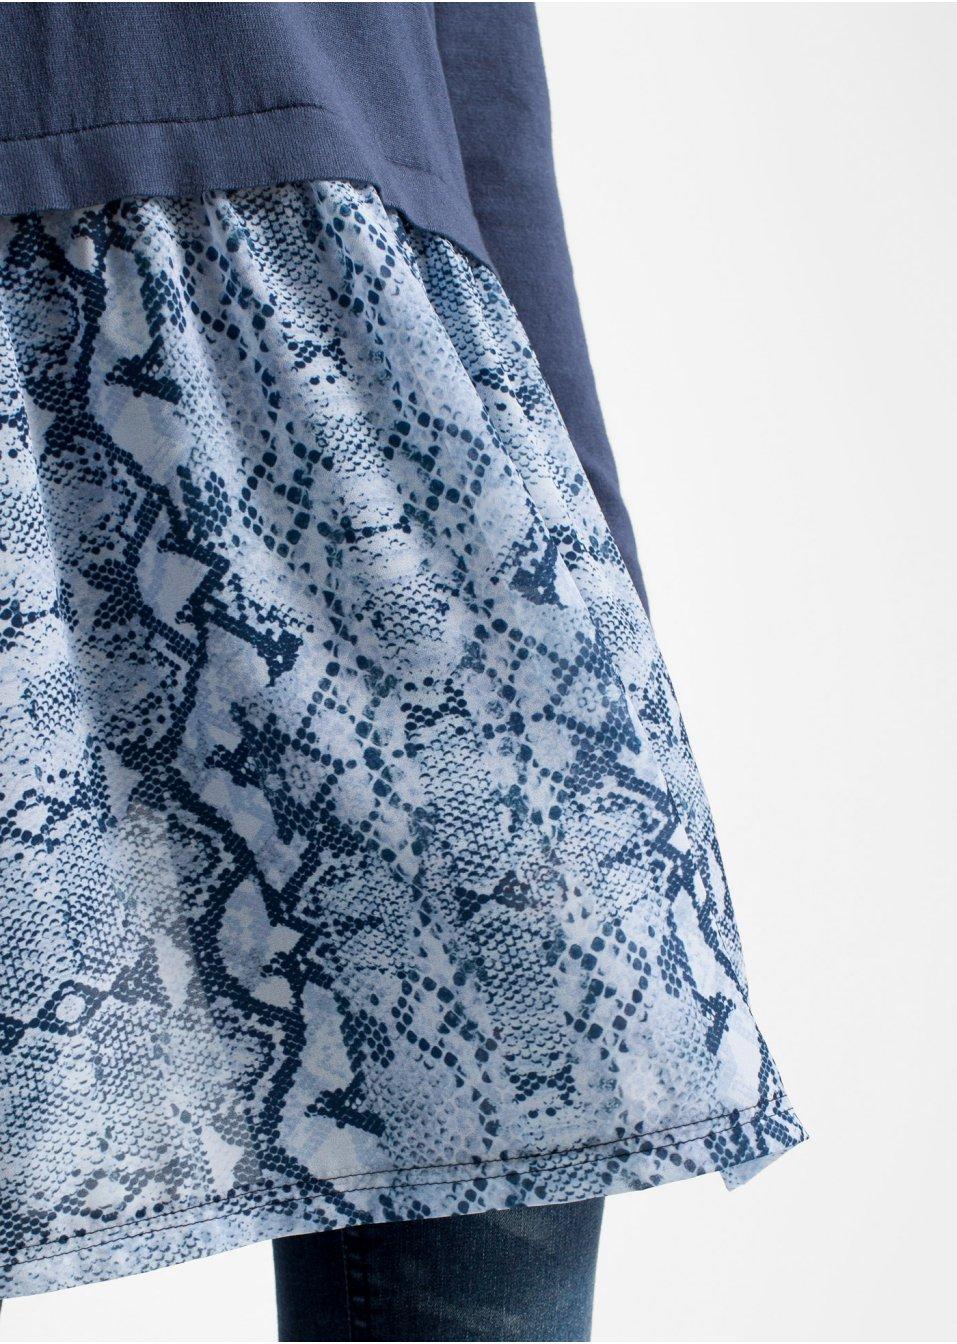 Mode Femme Vêtements DJLfdOFlkj Pull à empiècement jupe indigo/python RAINBOW commande online .fr